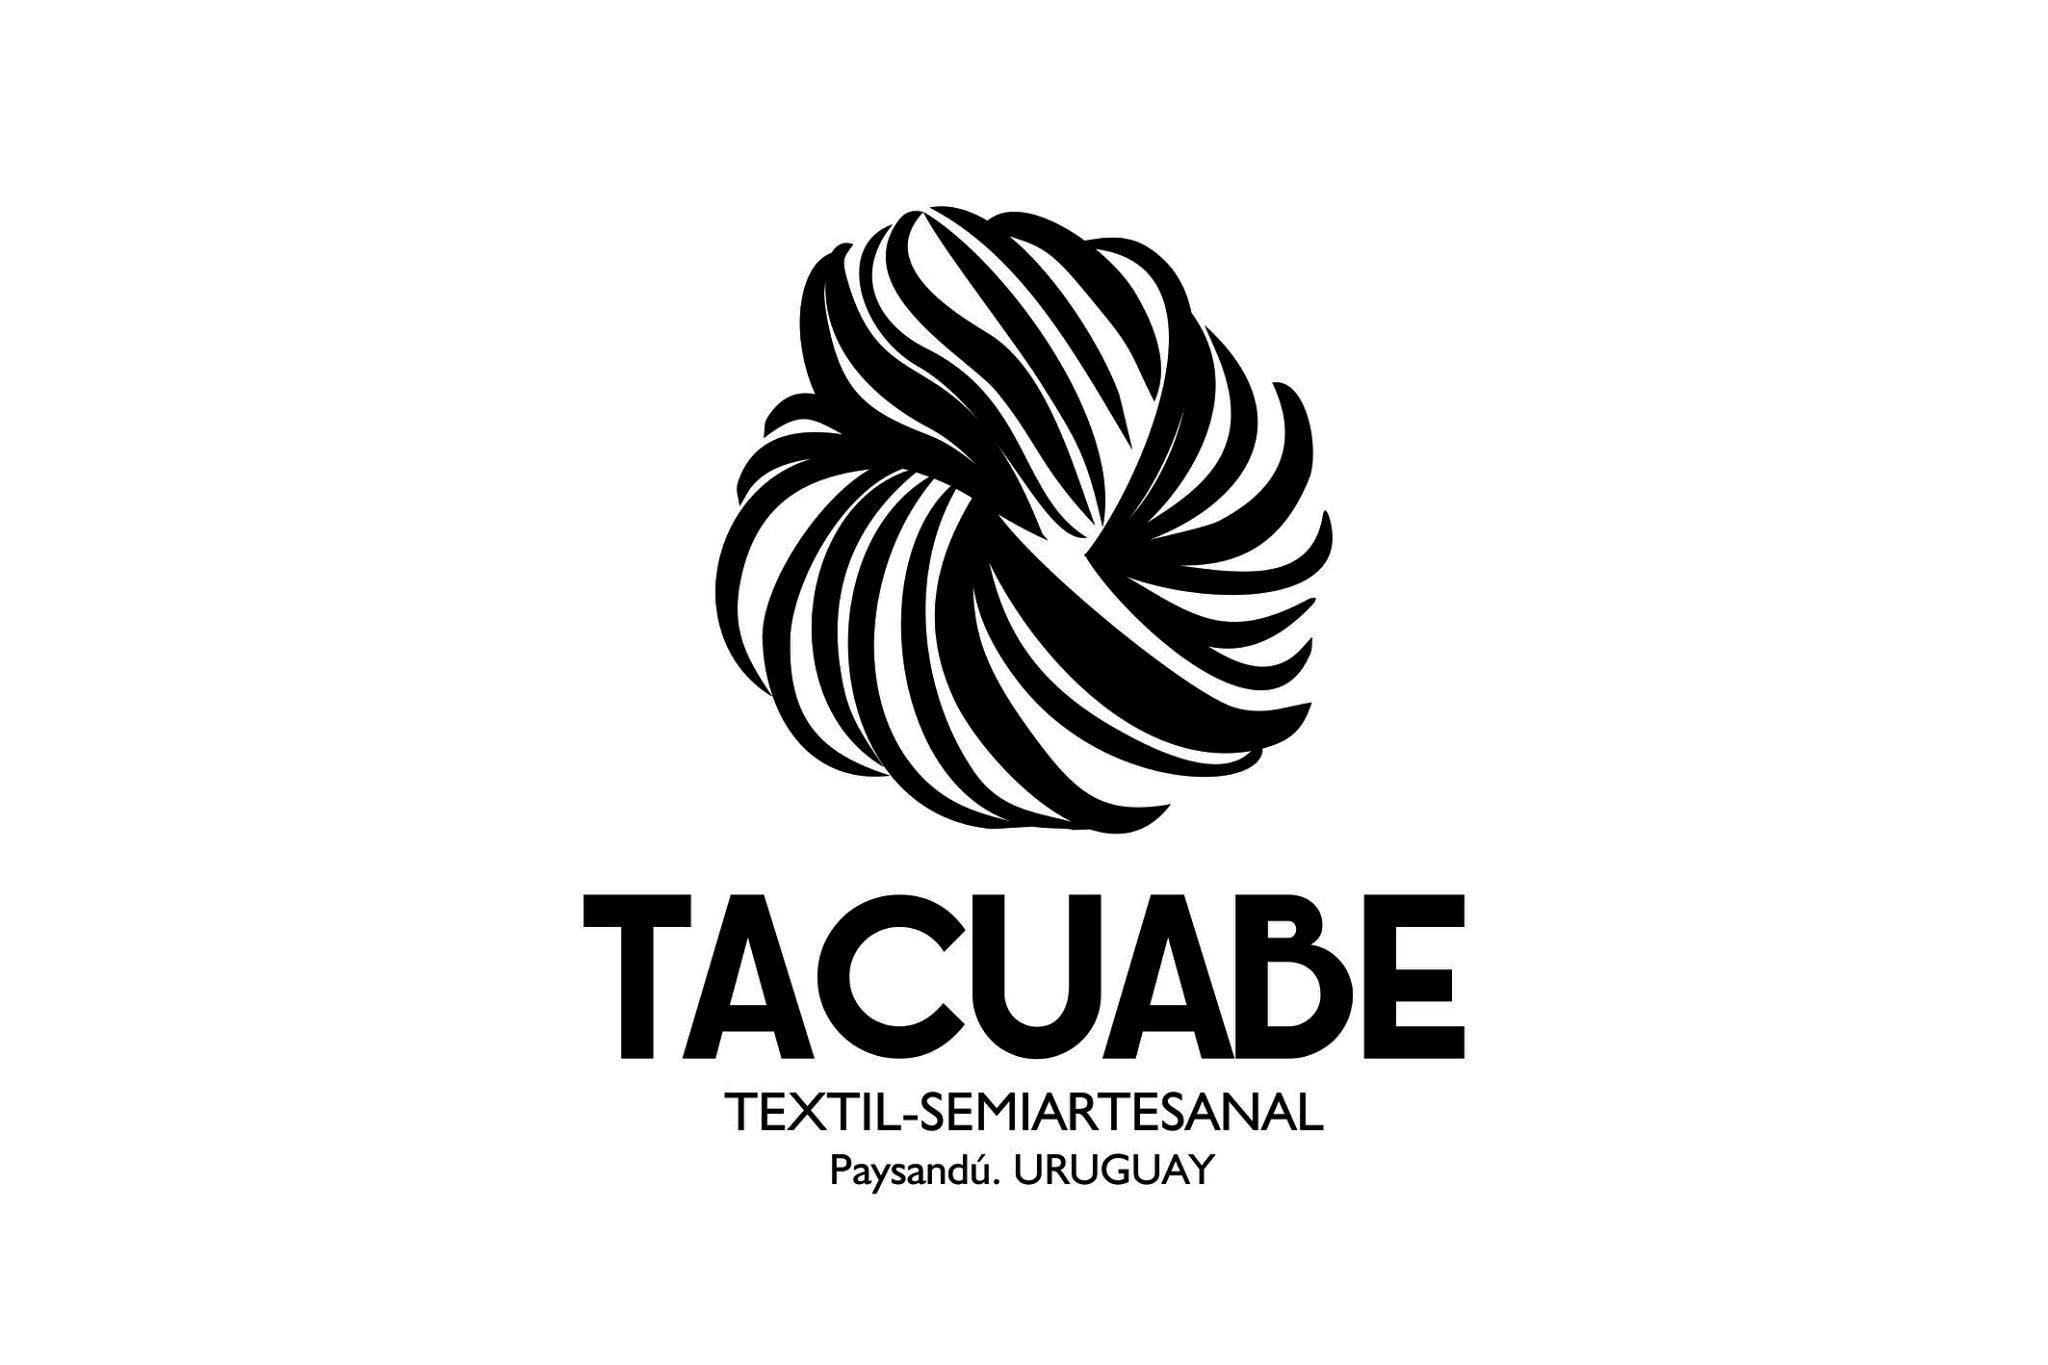 Tacuabé